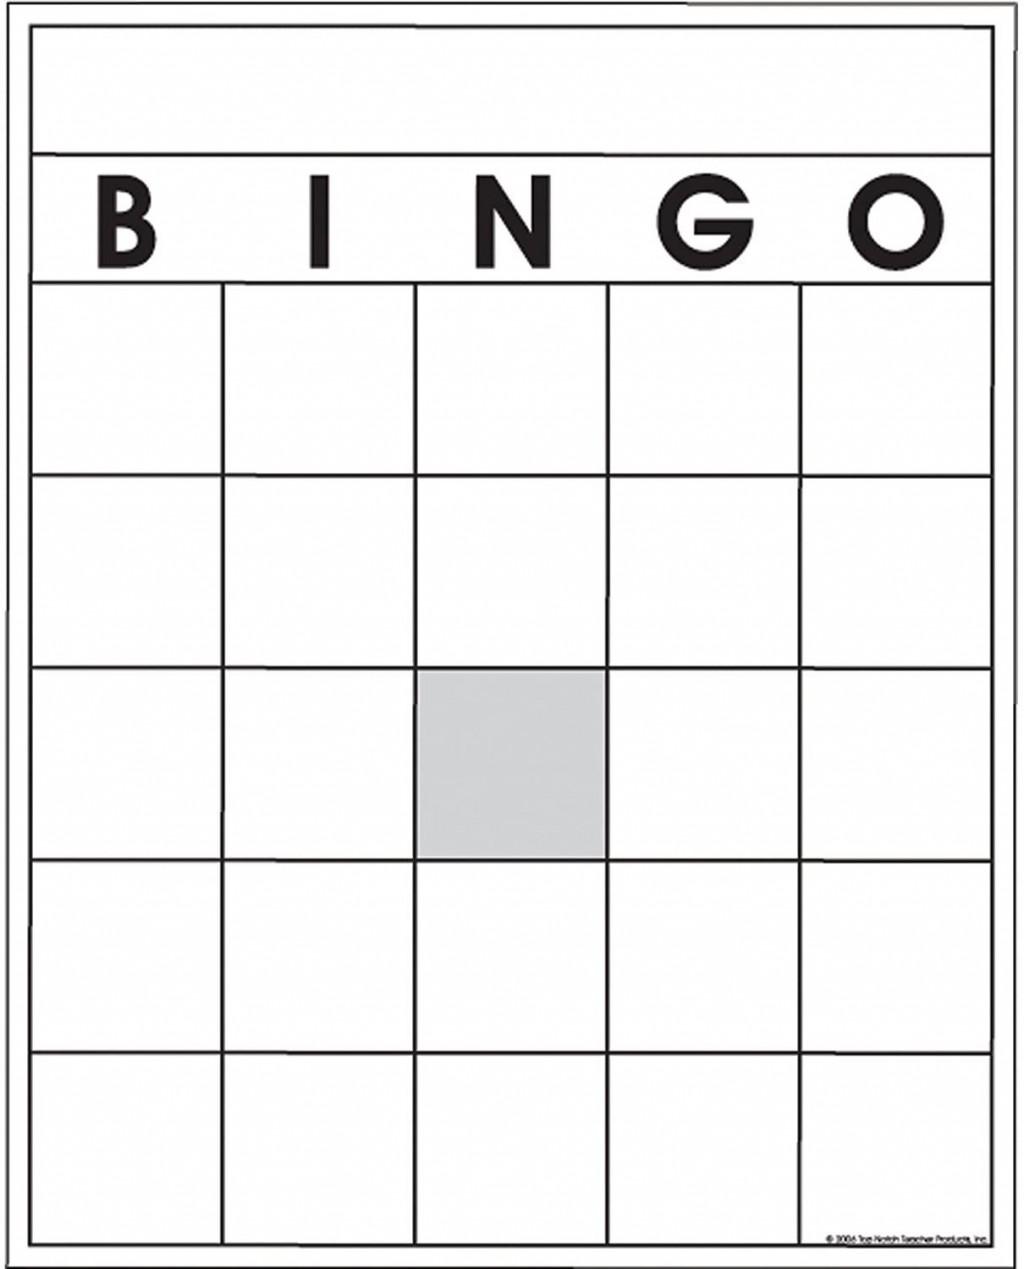 Blank Bingo Card Template Addictionary